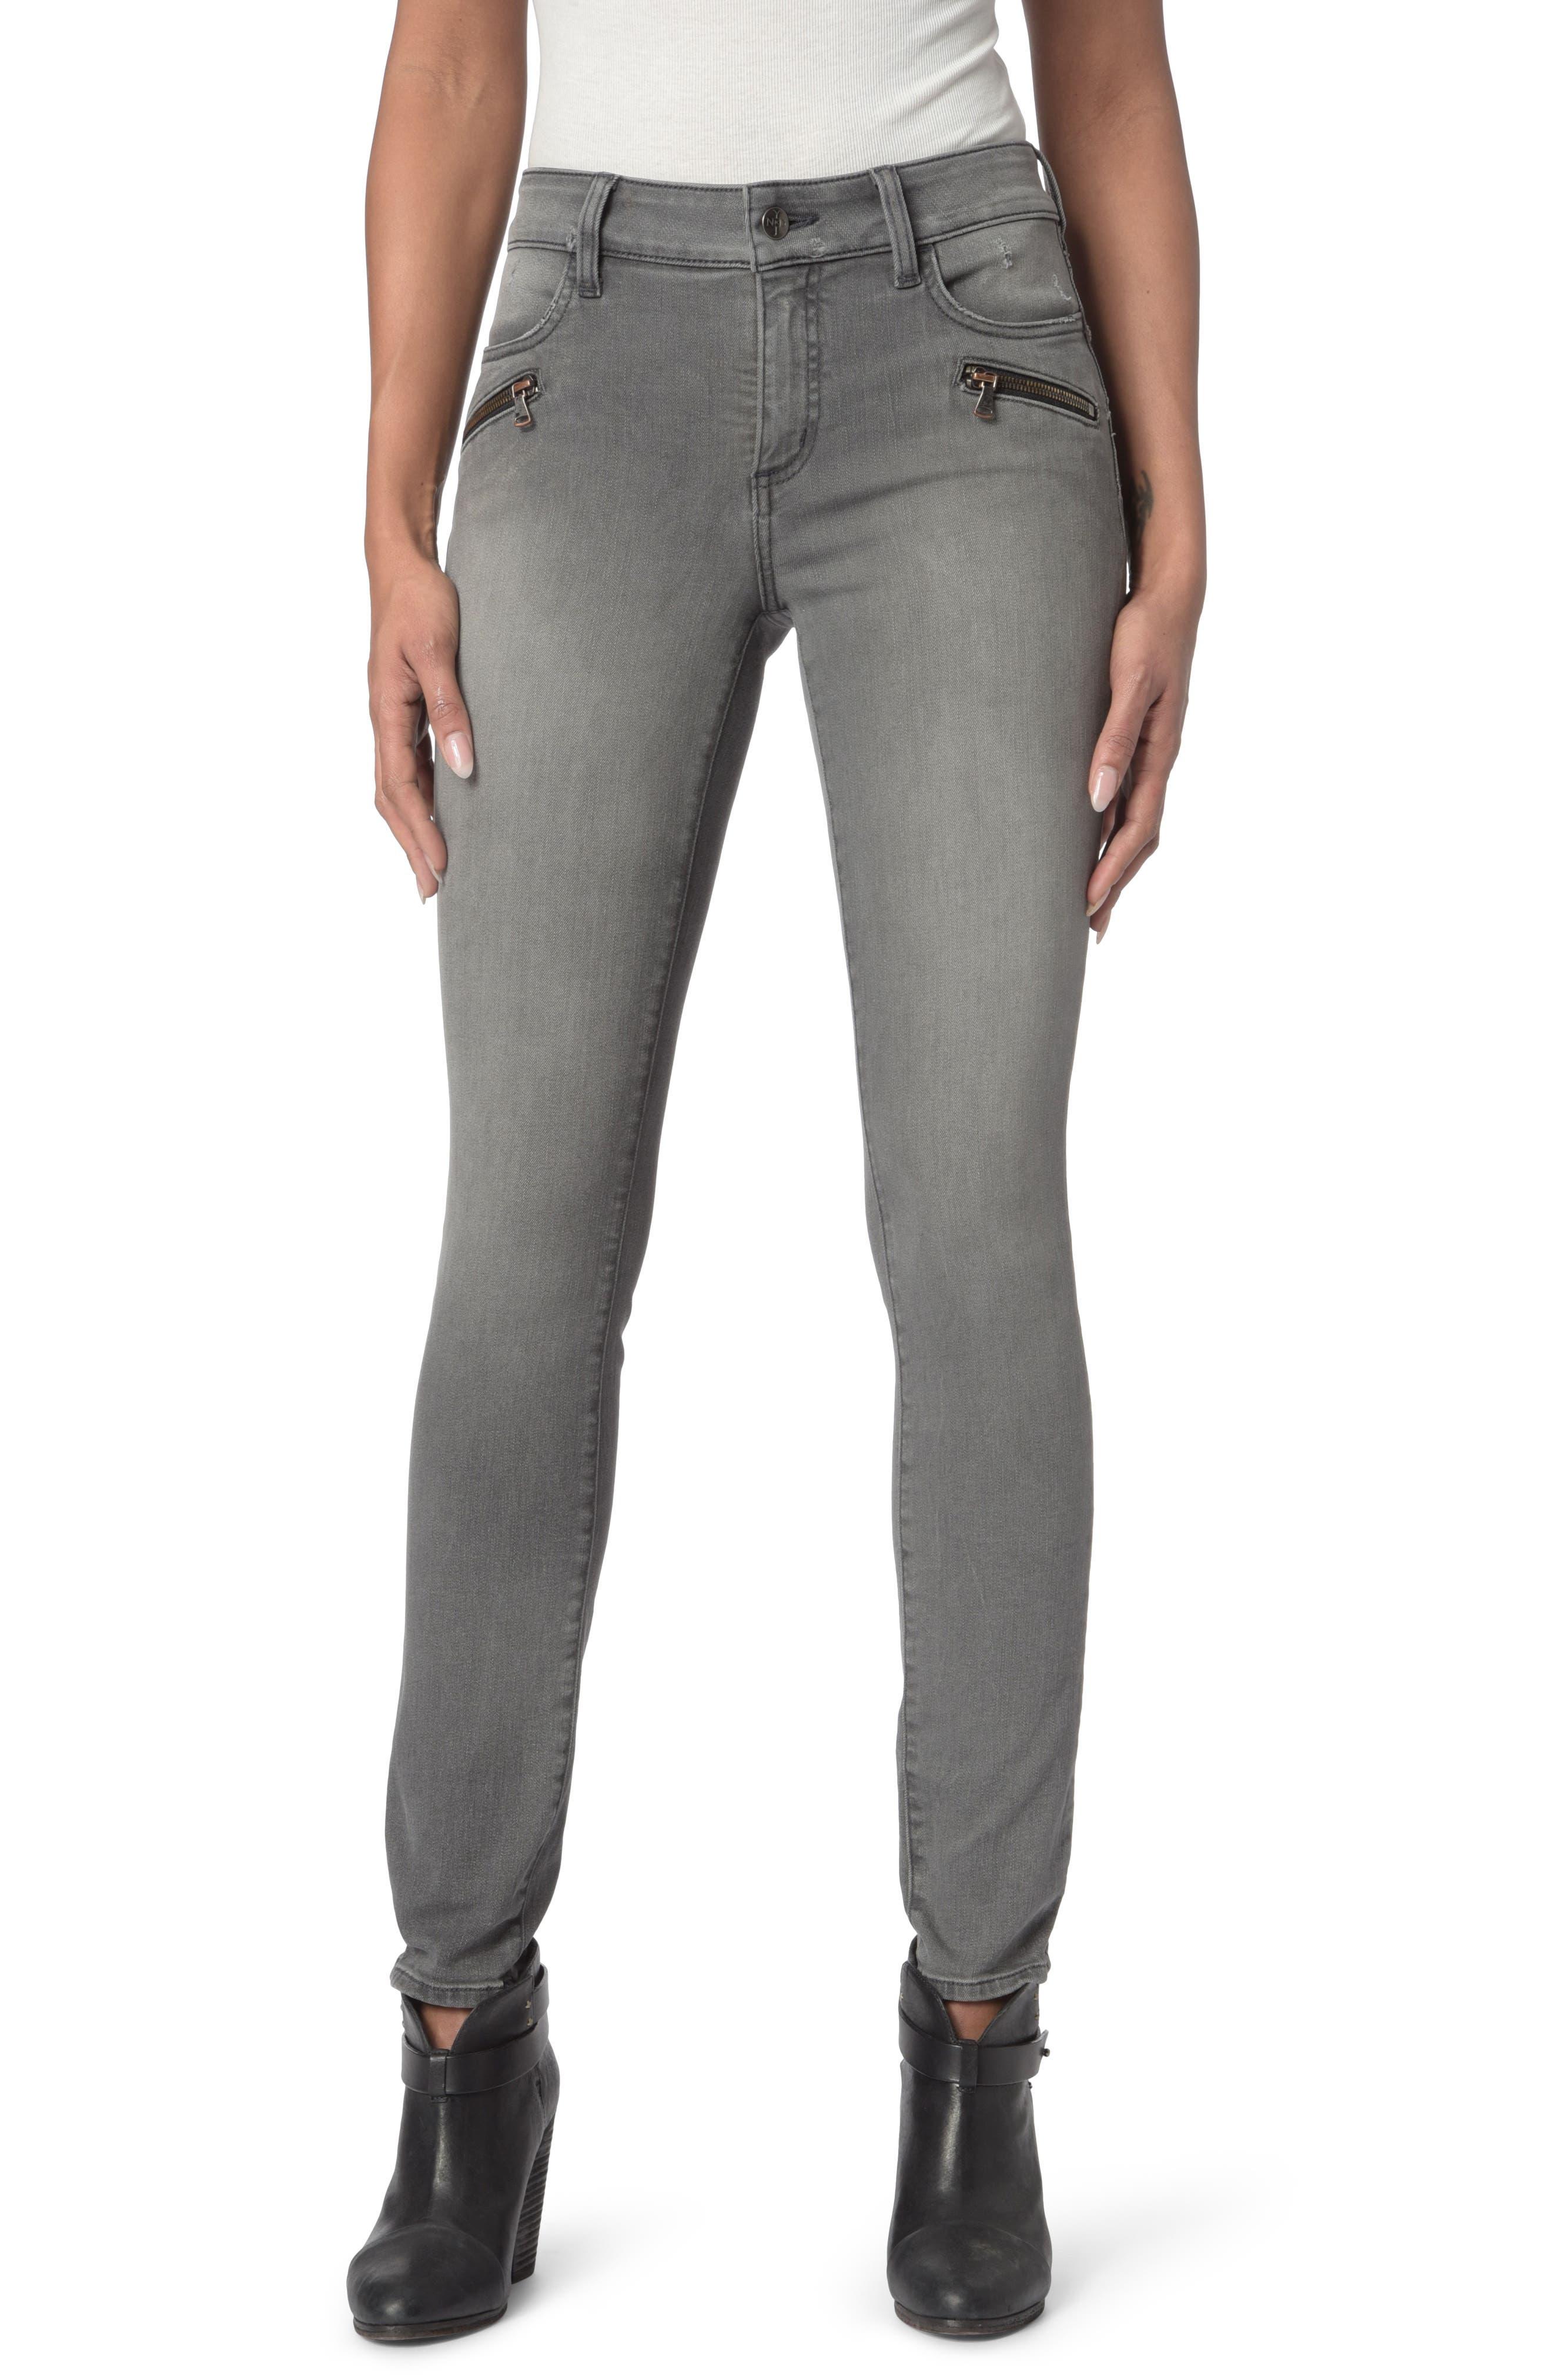 Alina Zippered Legging Jeans,                         Main,                         color, 035